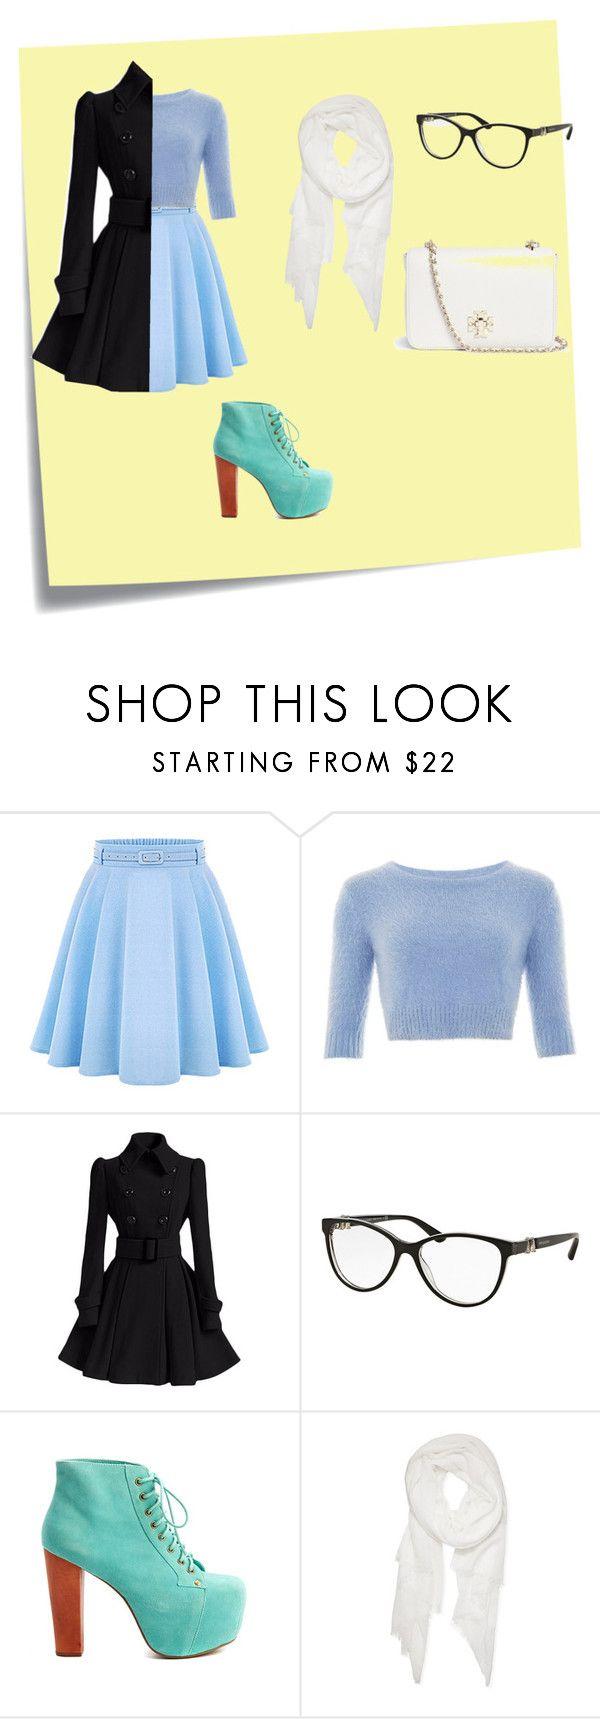 """#4"" by sadradinova-polina on Polyvore featuring мода, Post-It, WithChic, Bulgari, Jeffrey Campbell, Calvin Klein, Tory Burch, women's clothing, women's fashion и women"